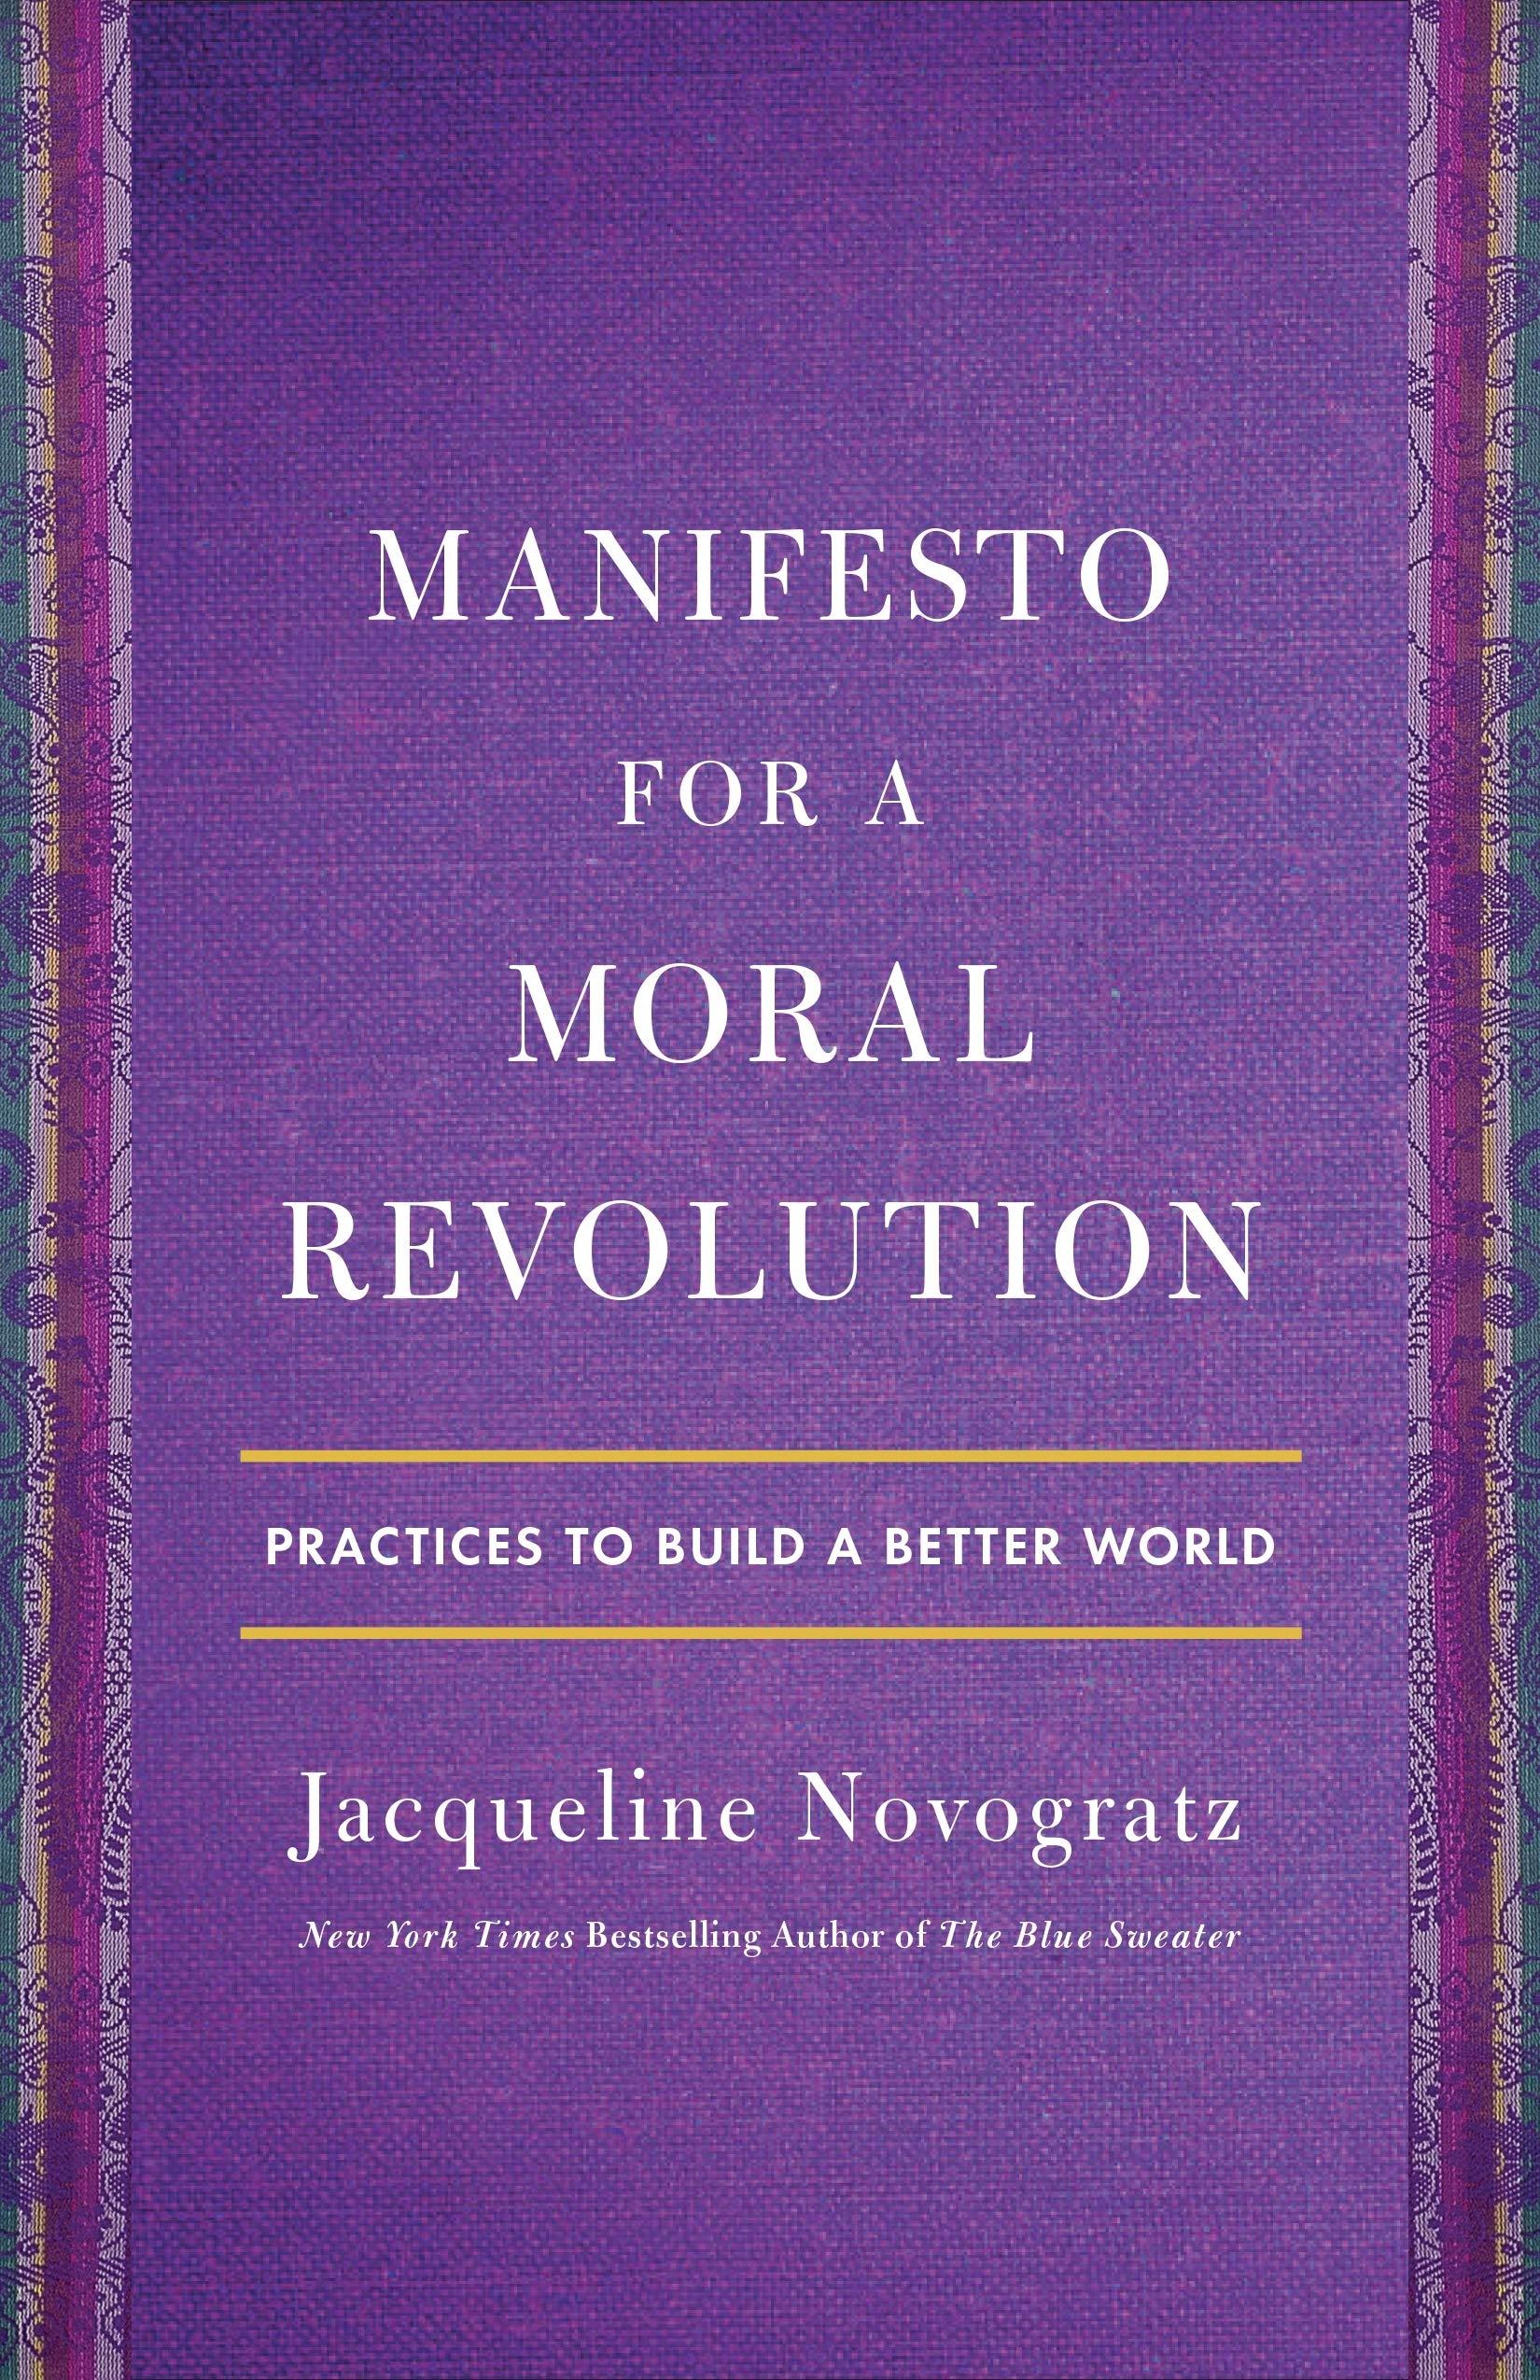 Amazon.com: Manifesto for a Moral Revolution: Practices to Build a Better World (9781250222879): Novogratz, Jacqueline: Books